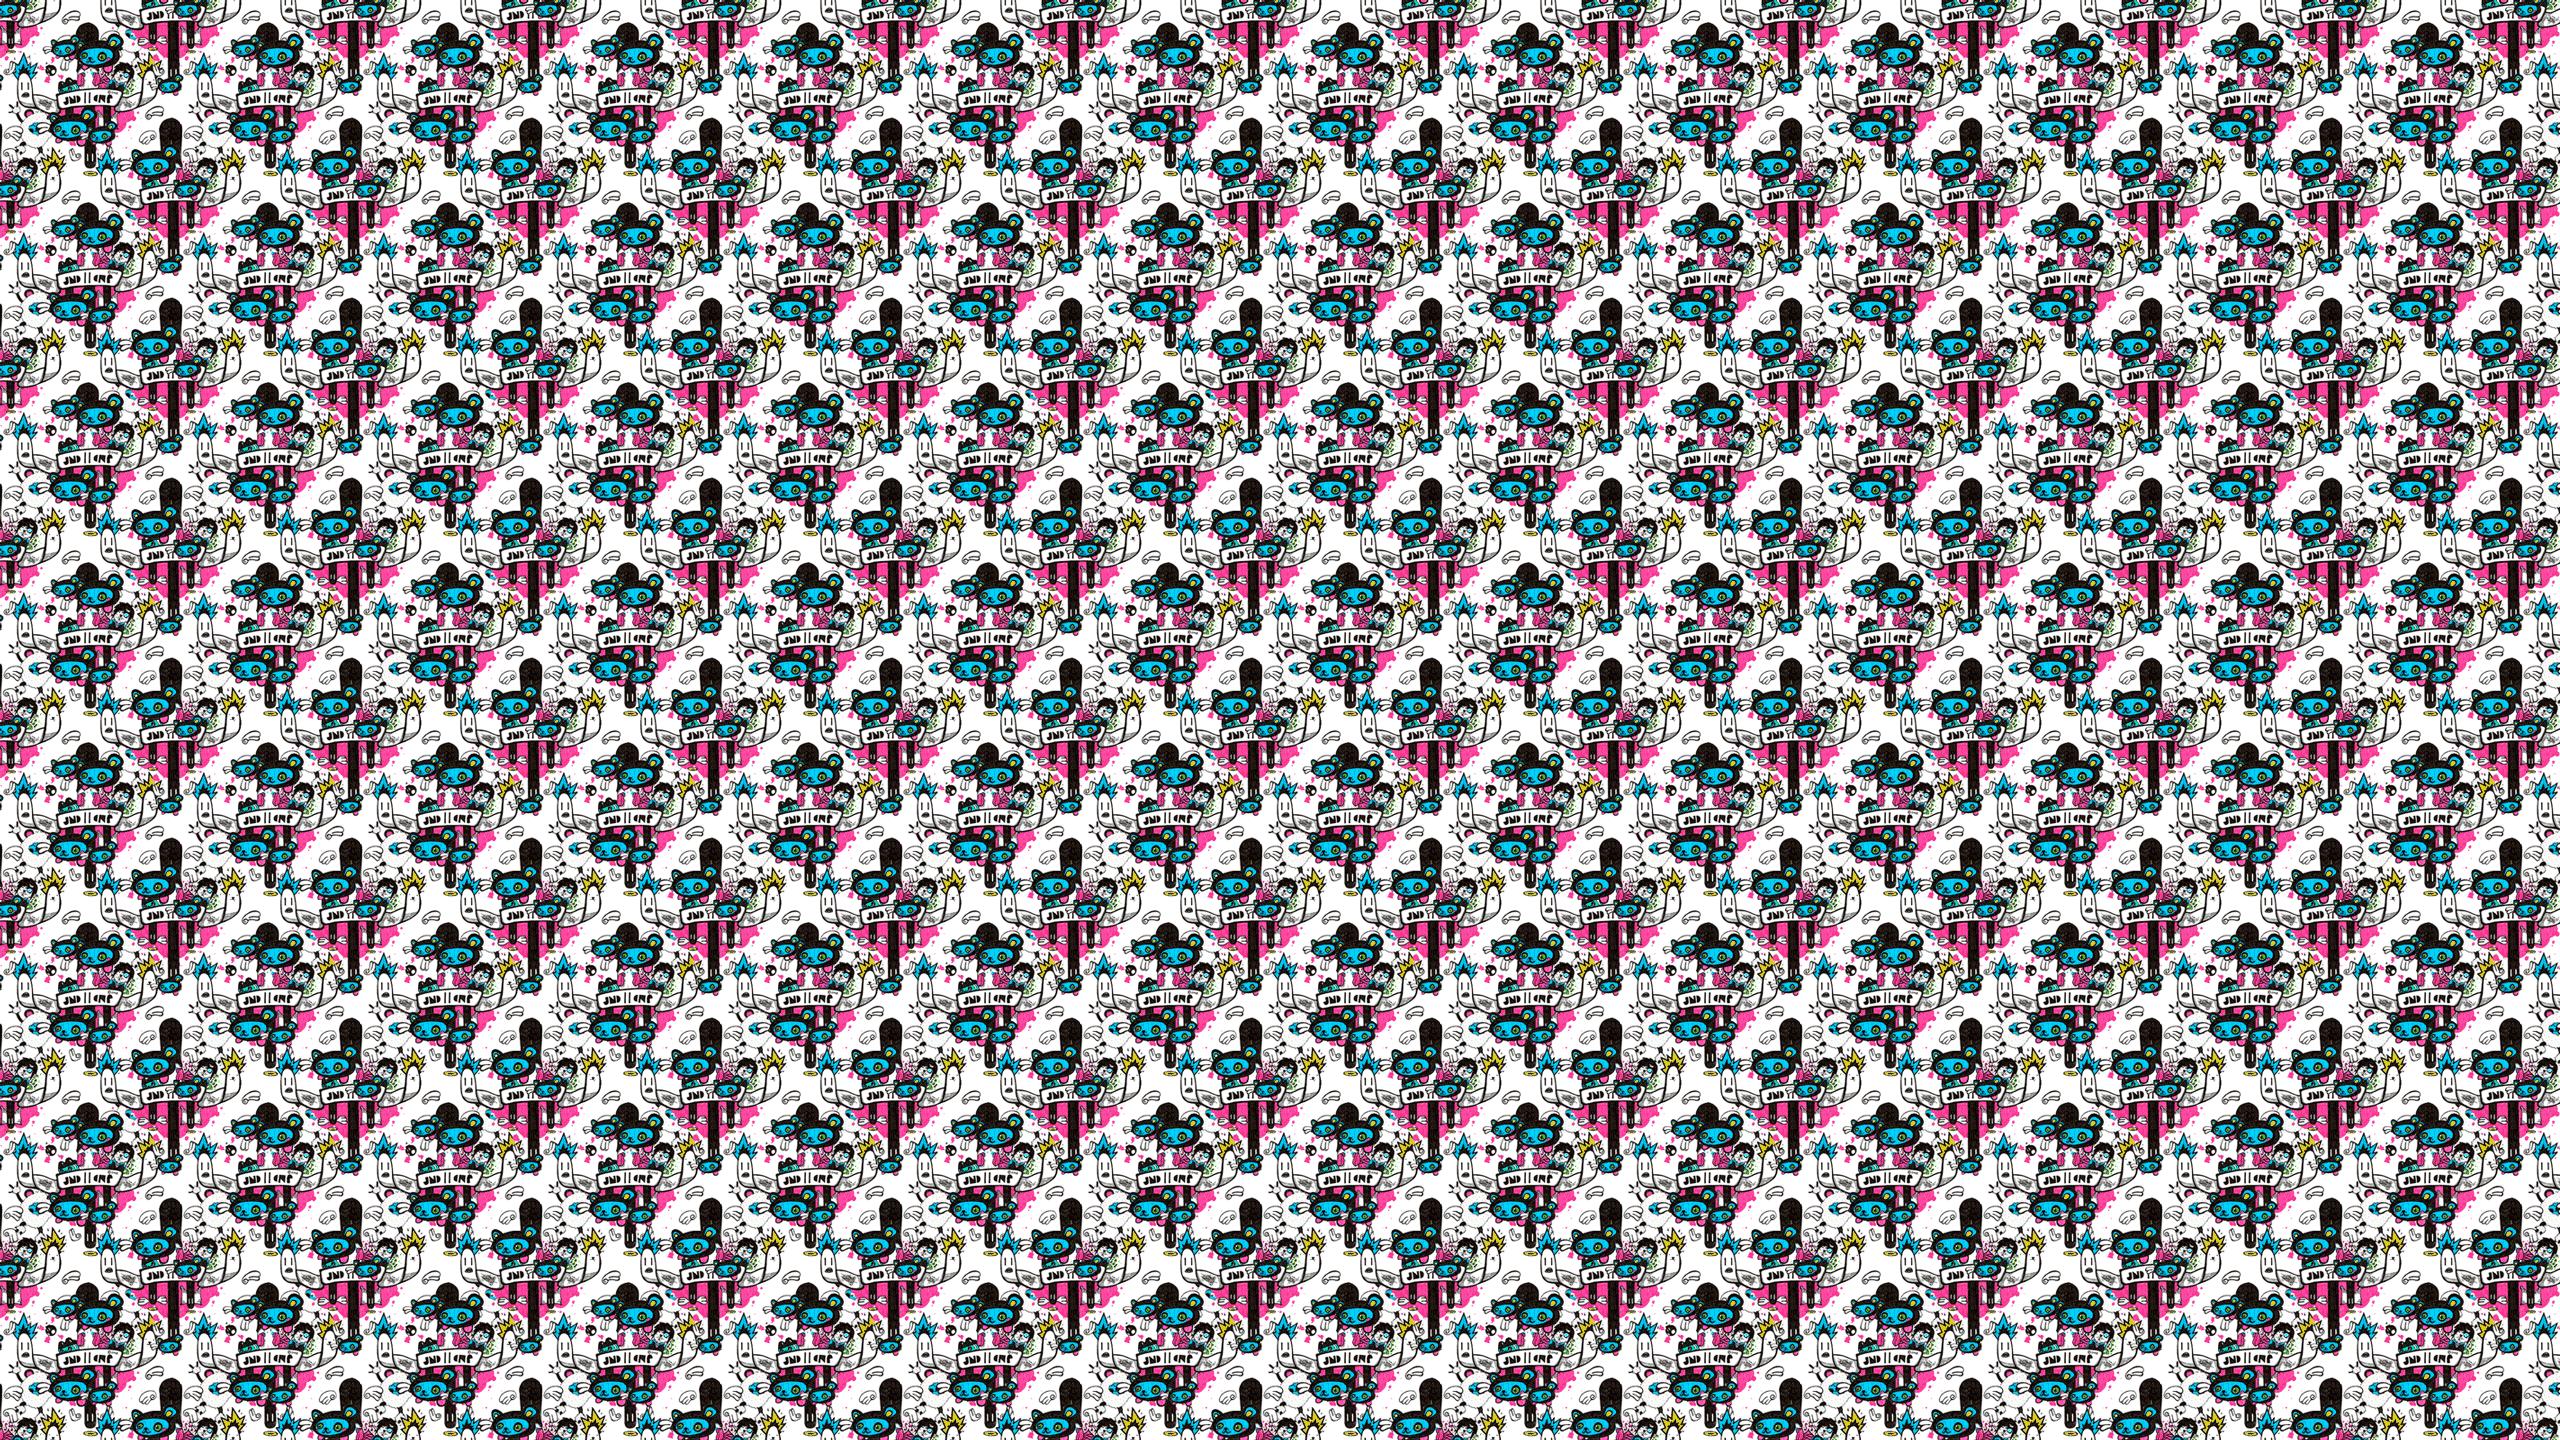 Installing this Cute Kawaii Droppers Desktop Wallpaper is easy Just 2560x1440